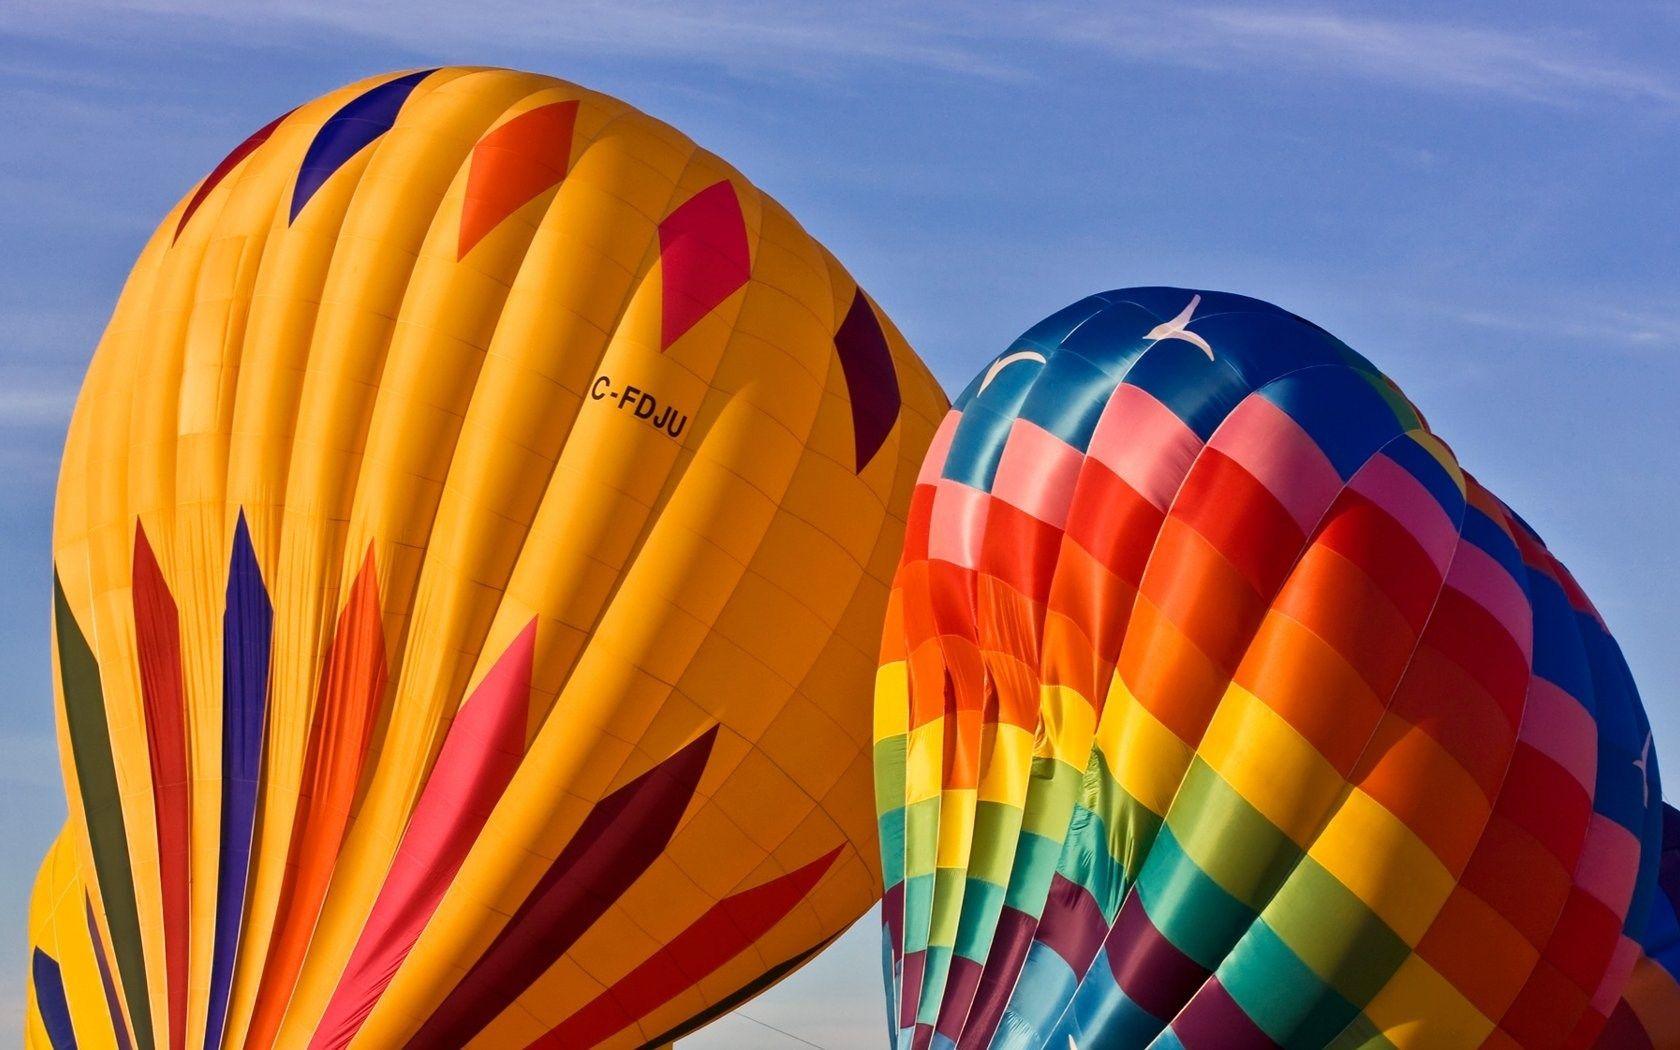 1680x1050 px hot air balloon wallpaper - full hd wallpapers, photos